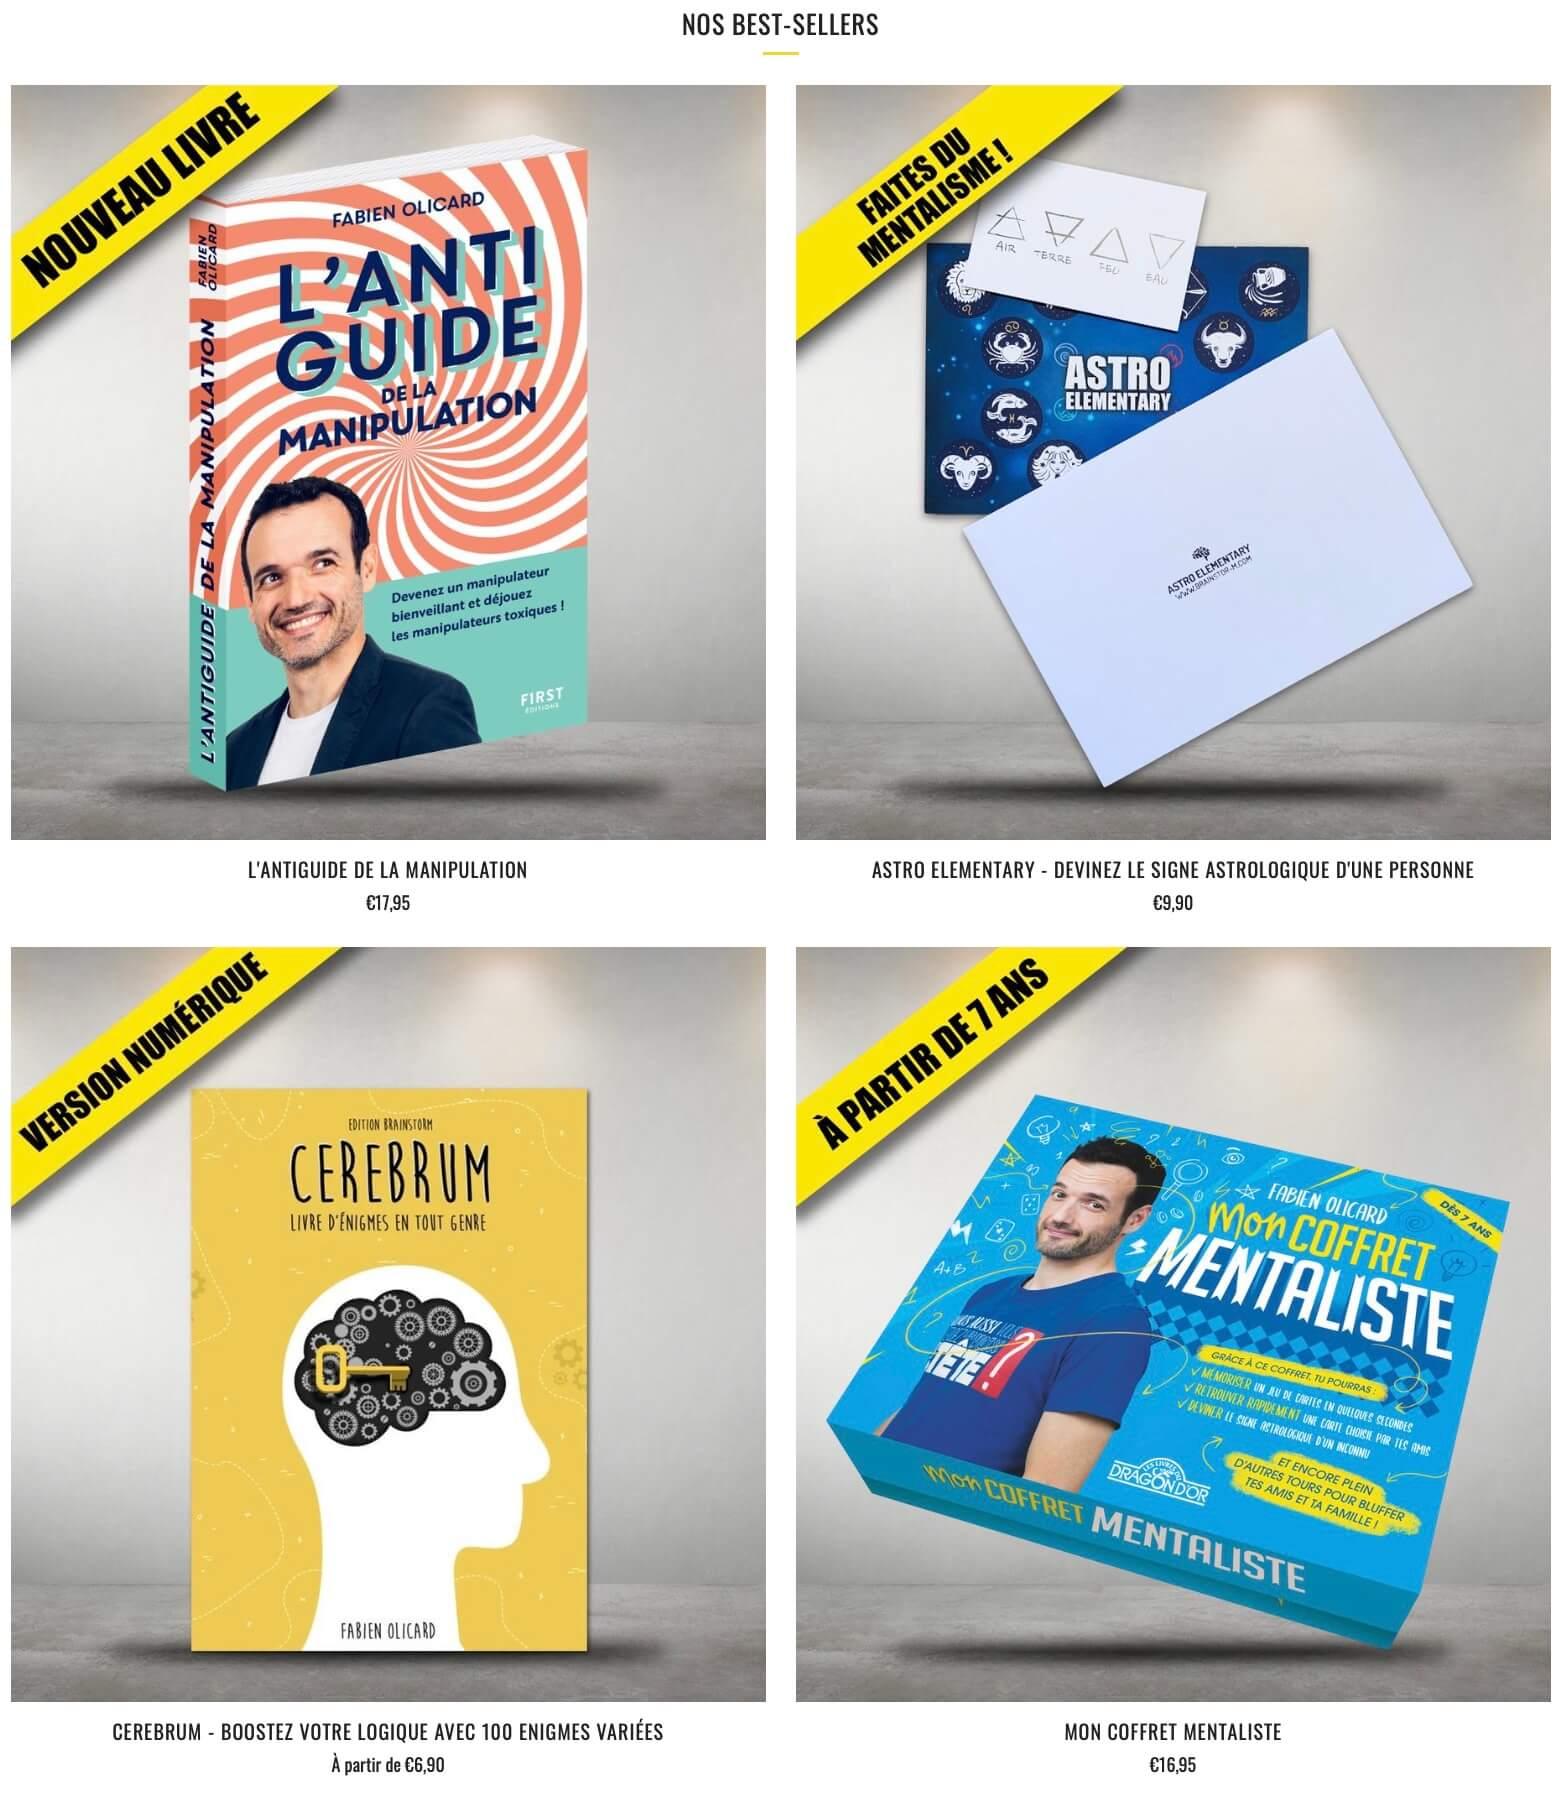 Fabien Olicard - Mentaliste | La boutique